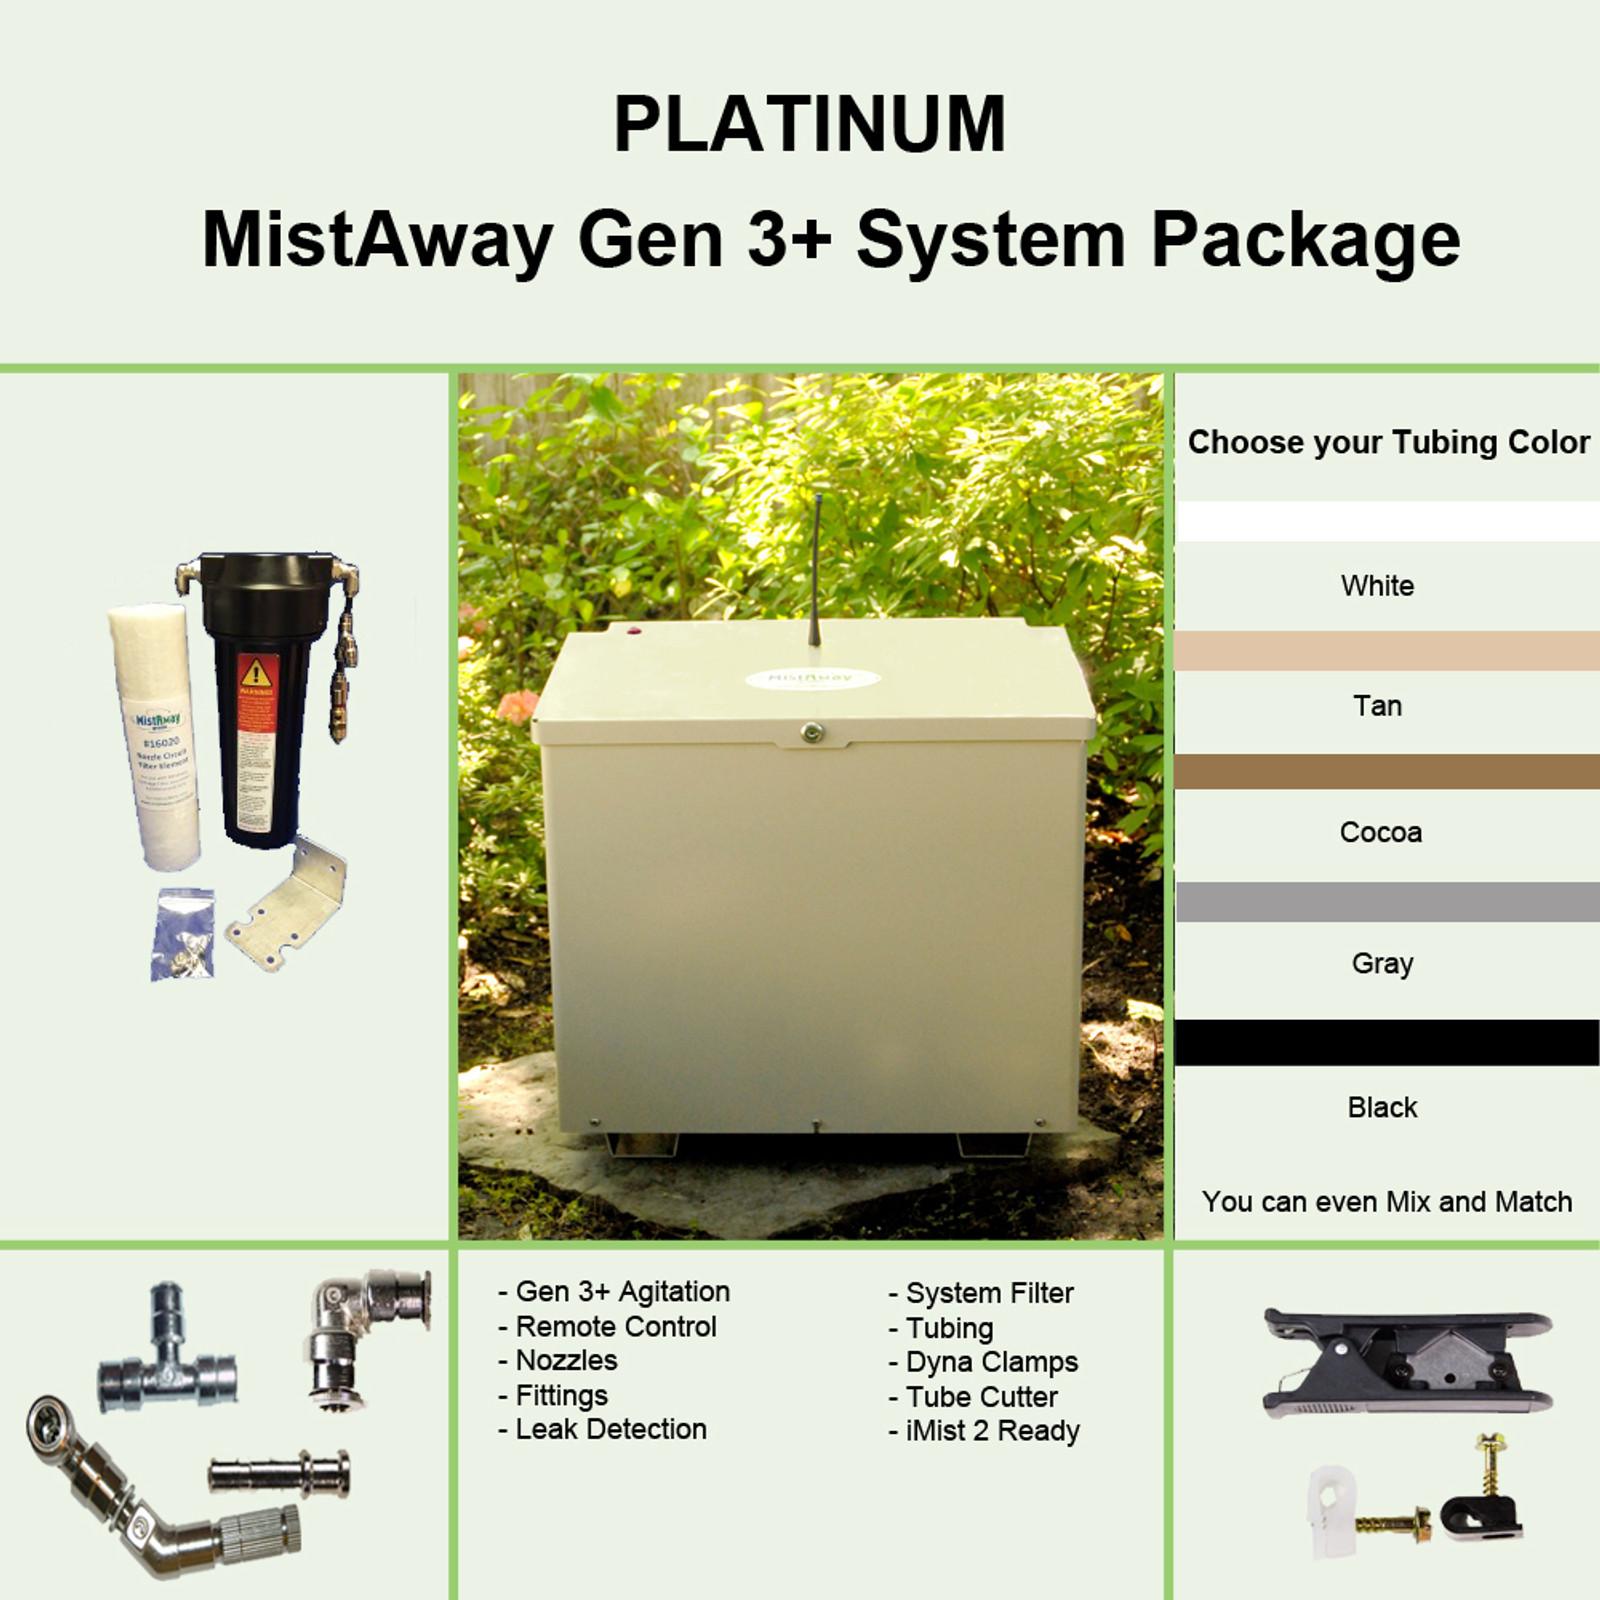 PLATINUM System Package